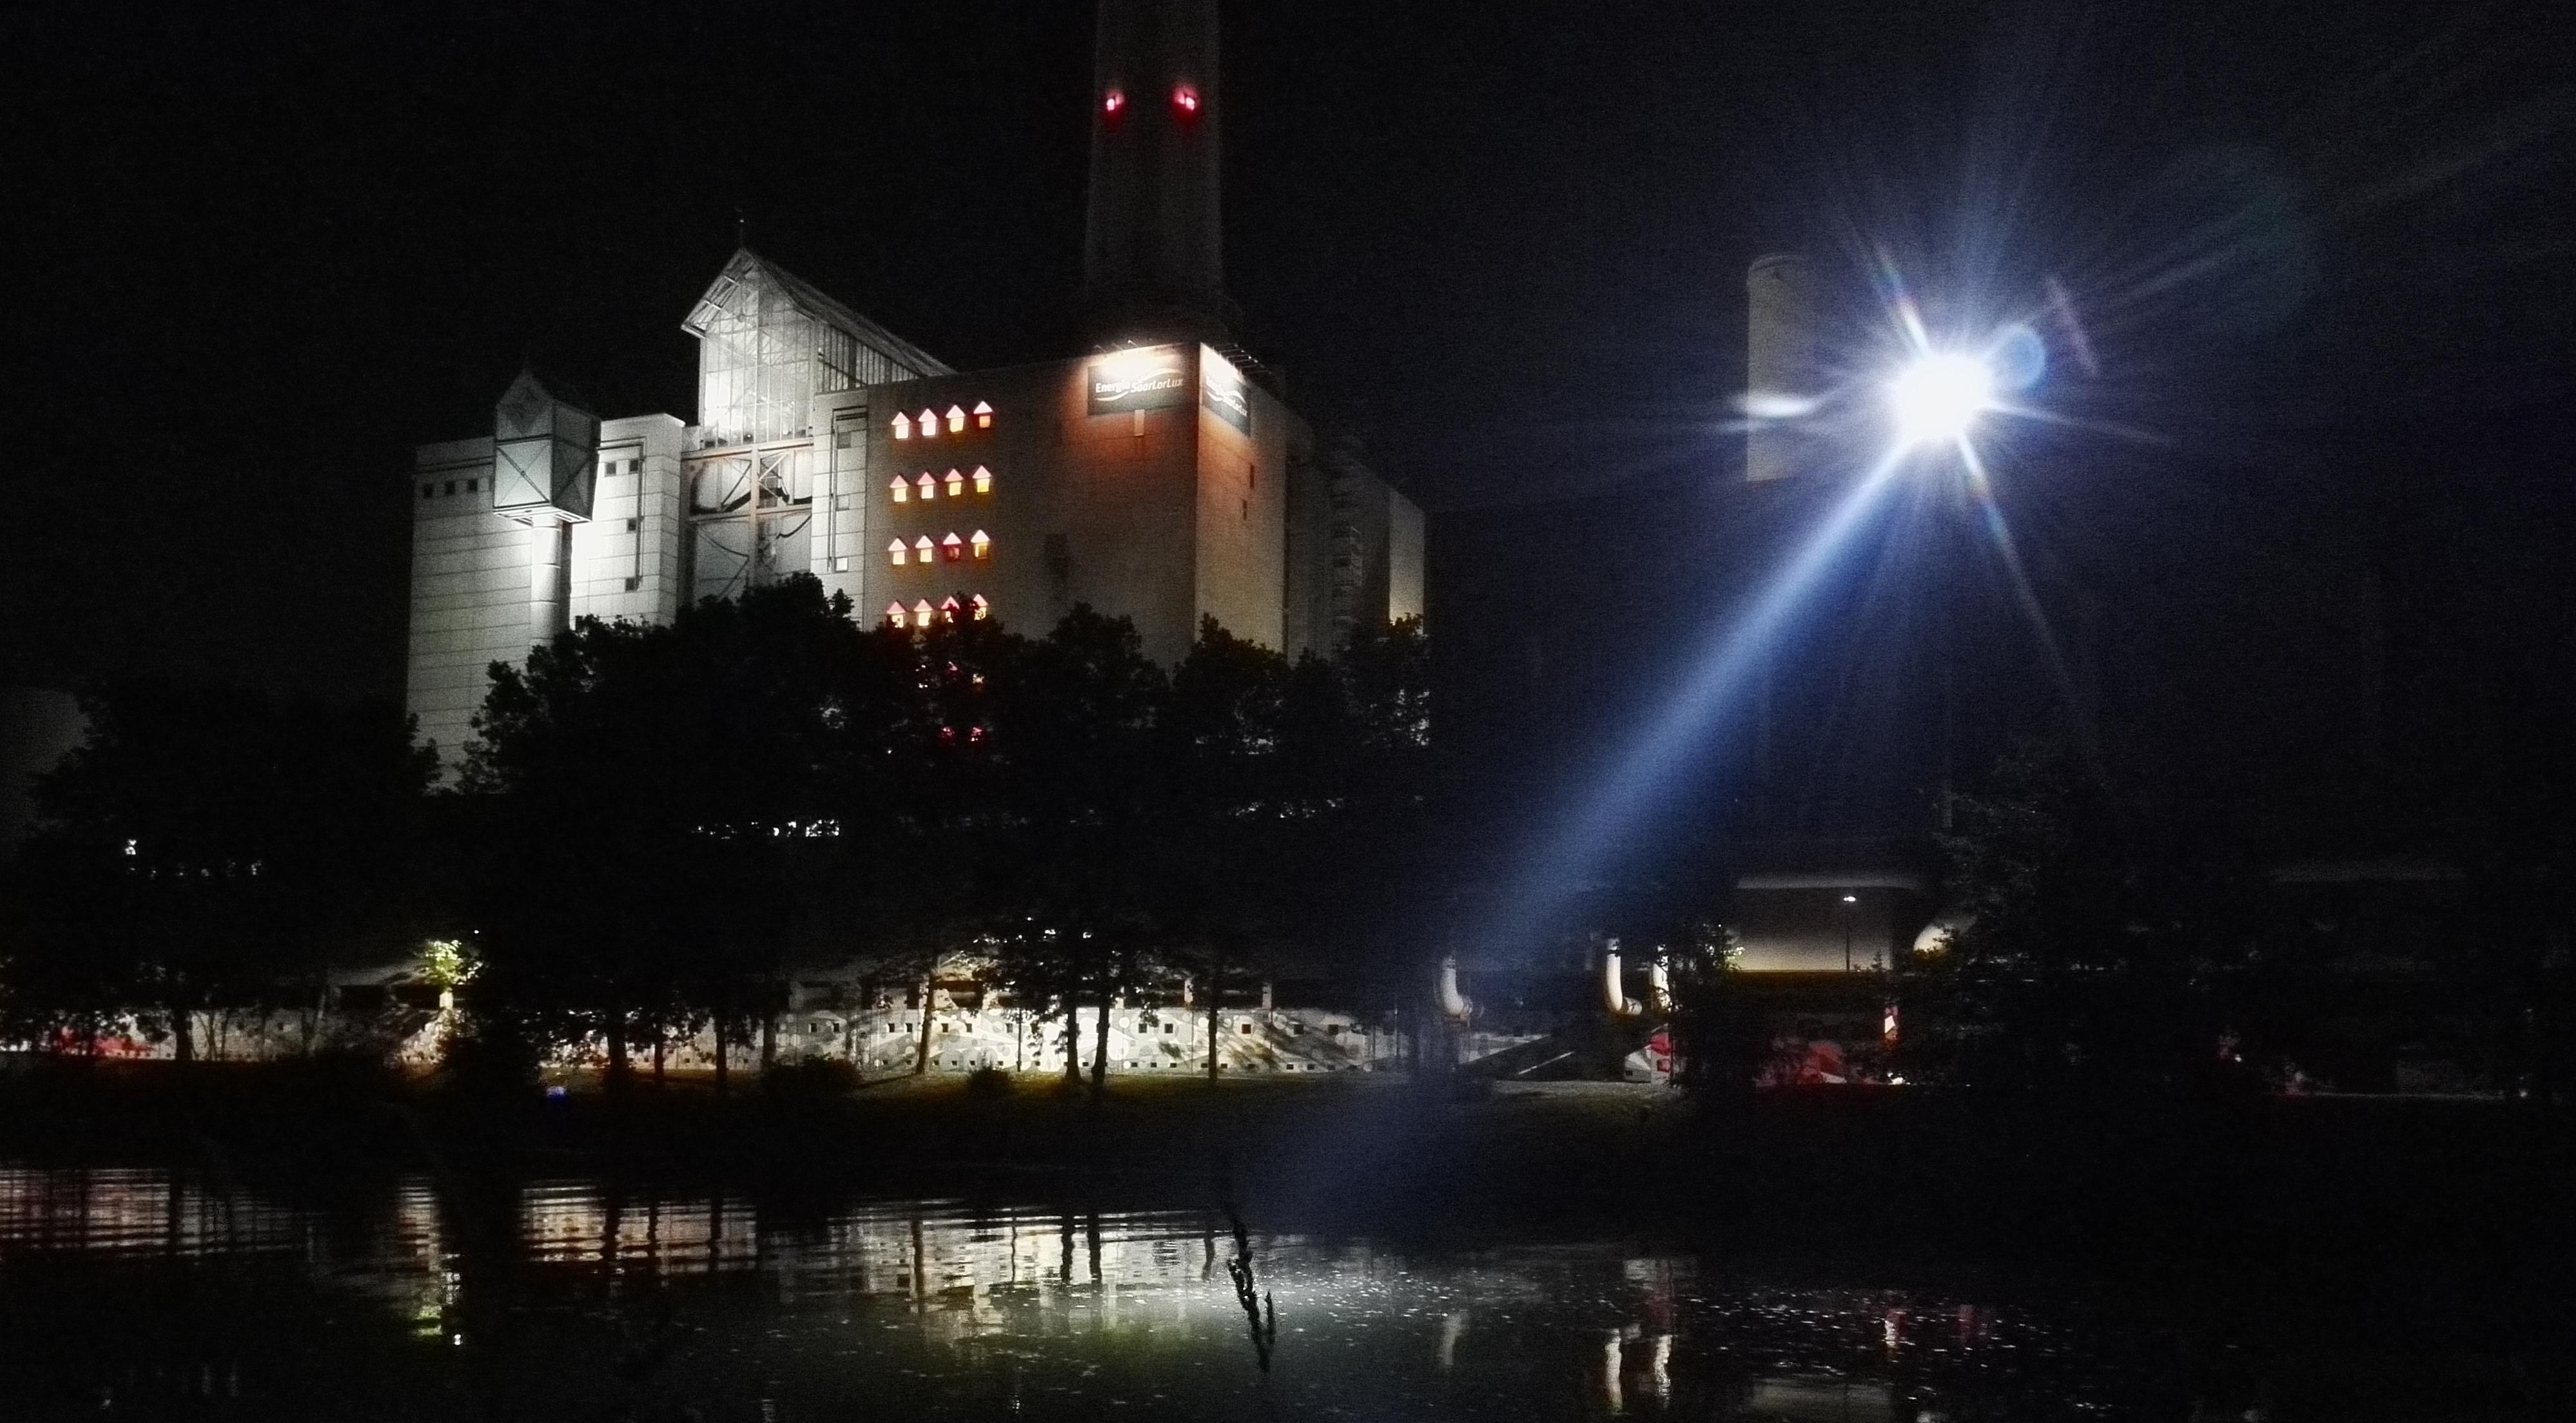 Heizkraftwerk, Saarbrücken